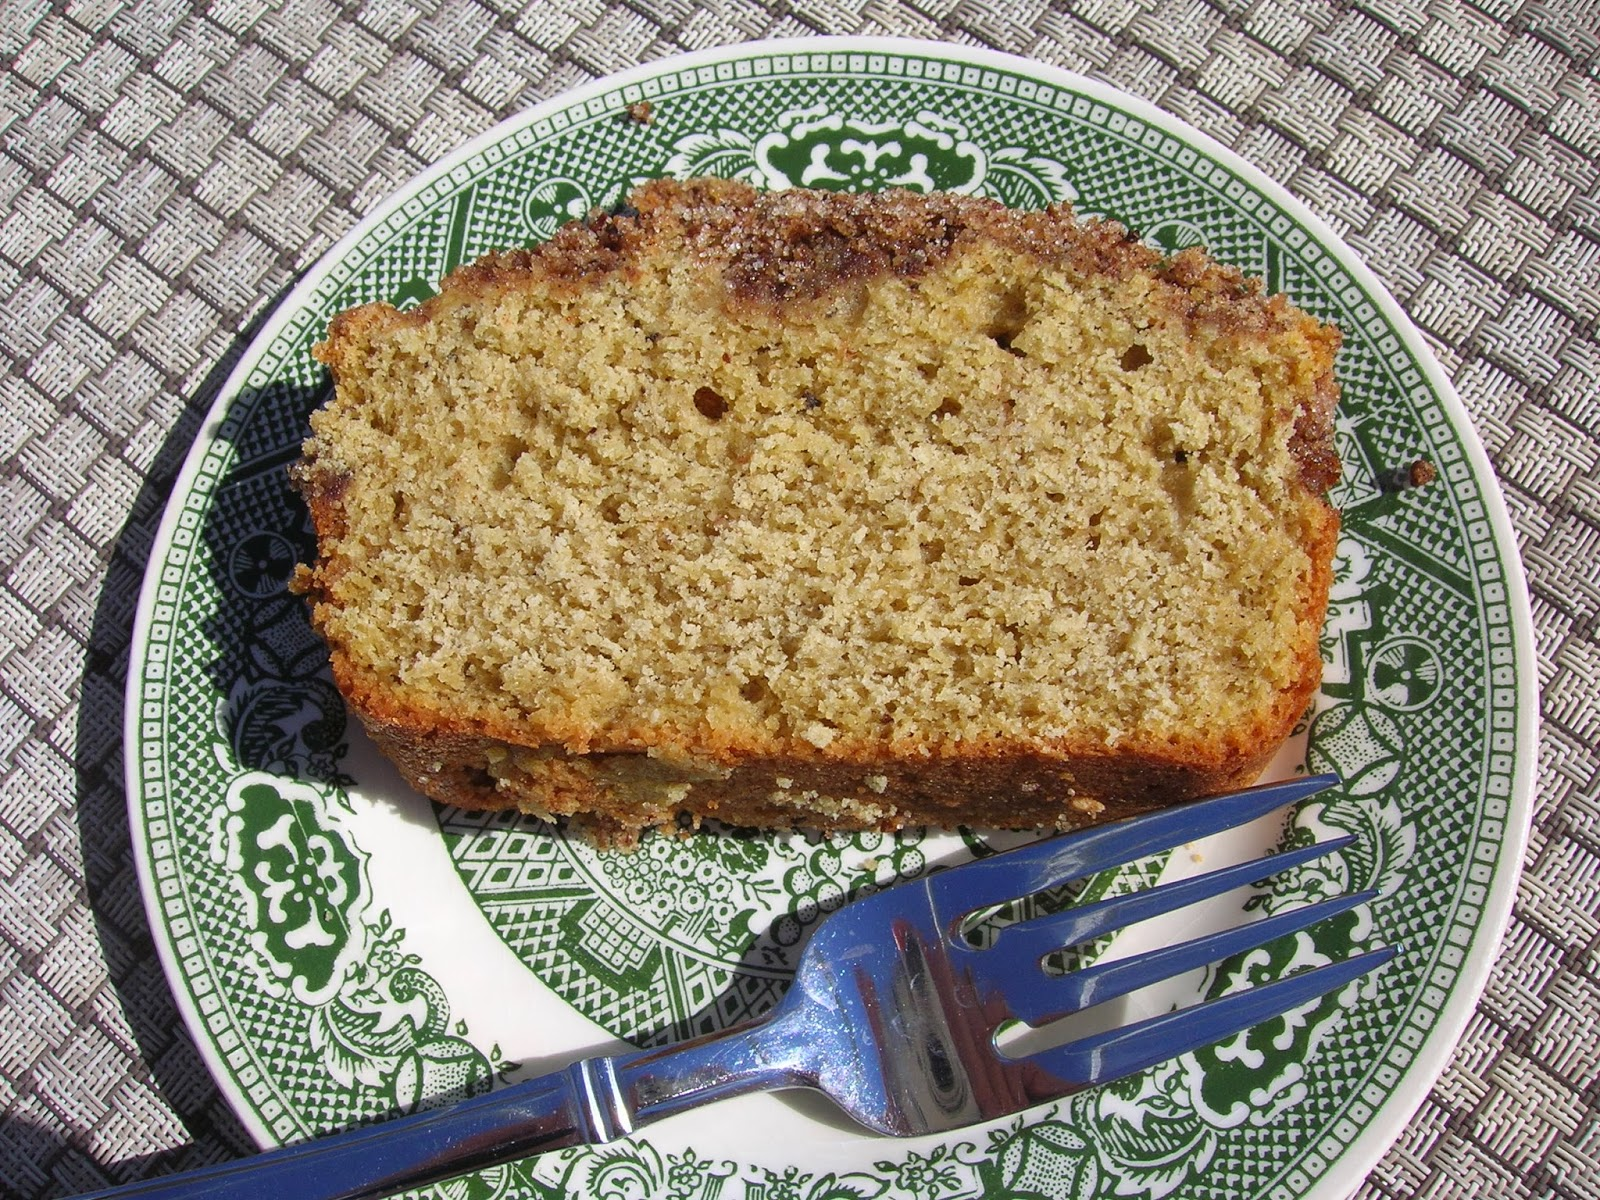 ... GF Chef : Gluten Free Cinnamon Tea Bread, lower carbs! xanthan free